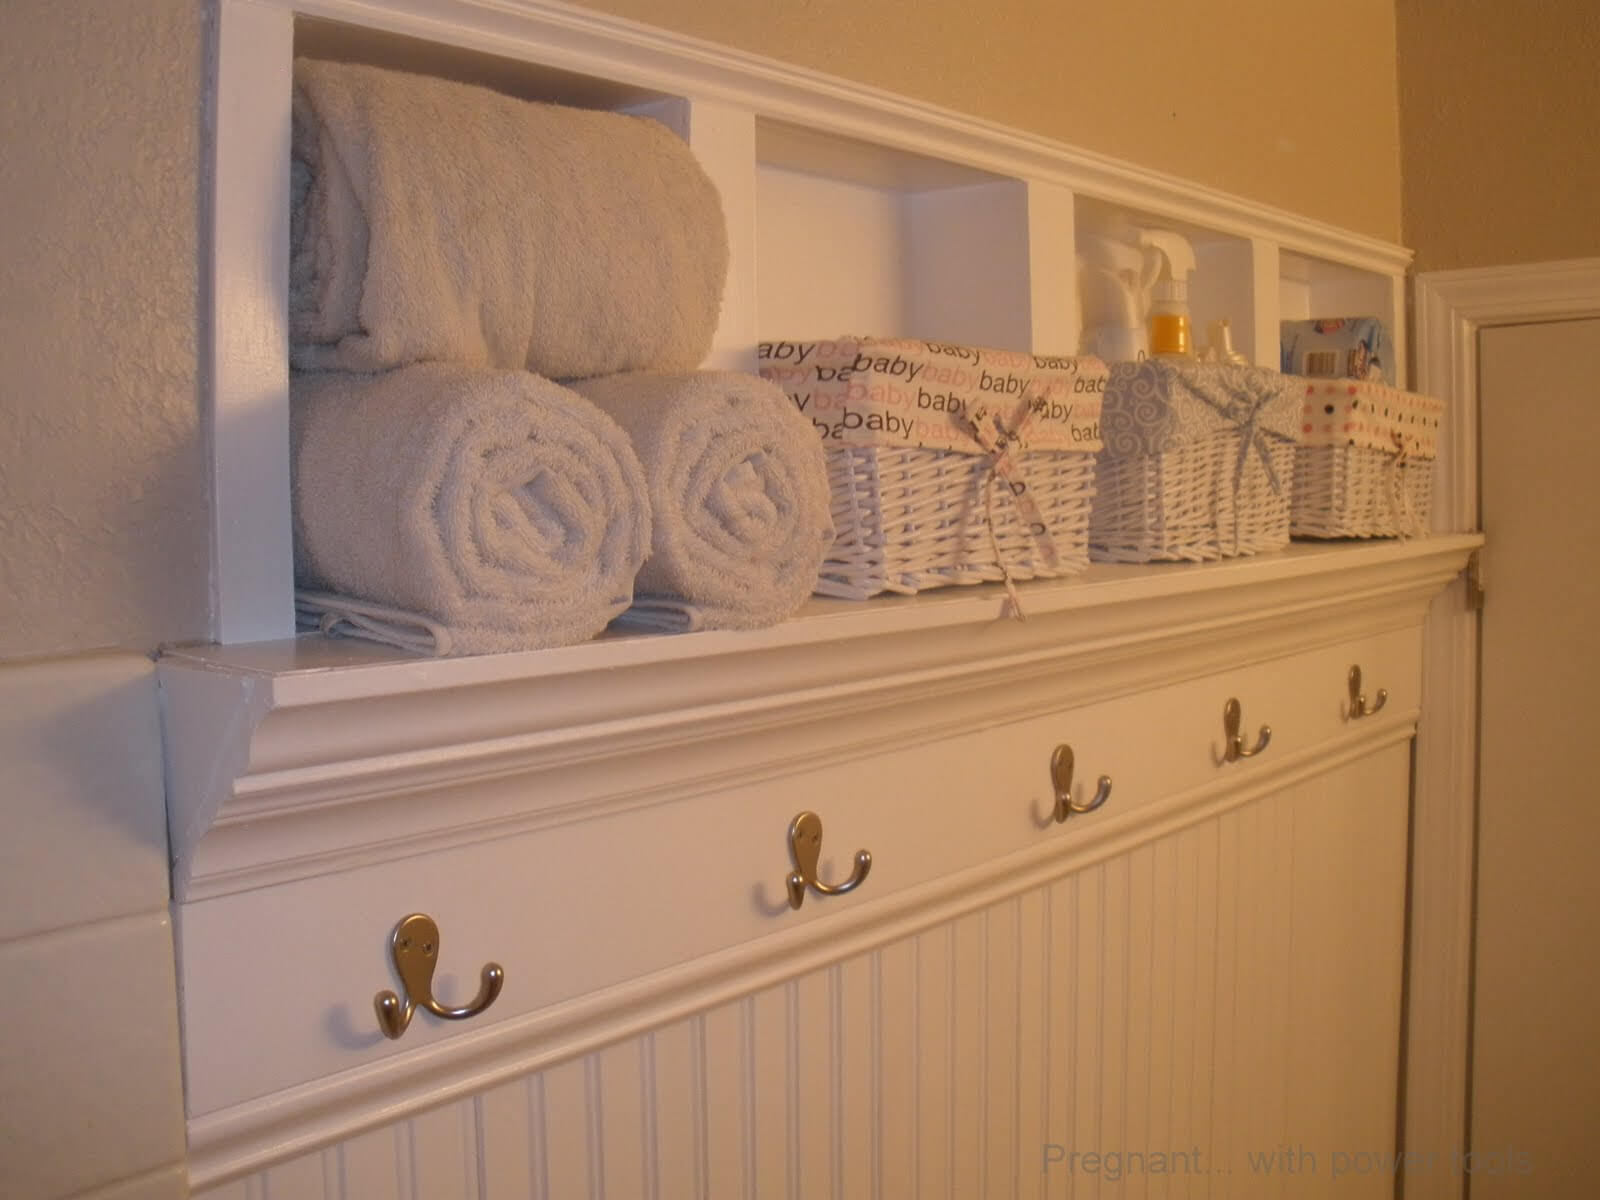 Fullsize Of Wall Shelf Ideas For Bathroom